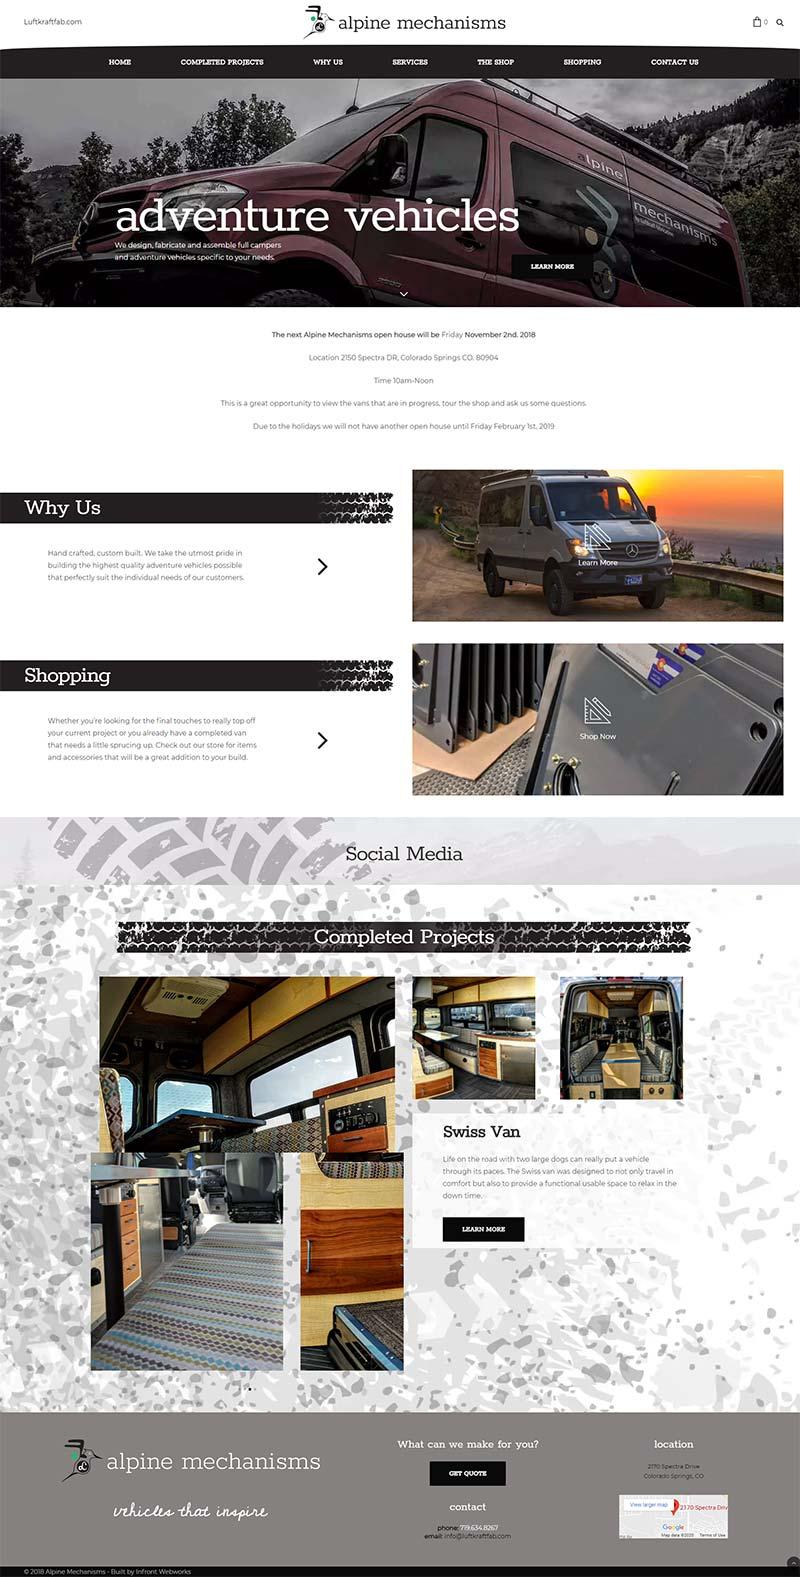 alpine mechanisms website front page